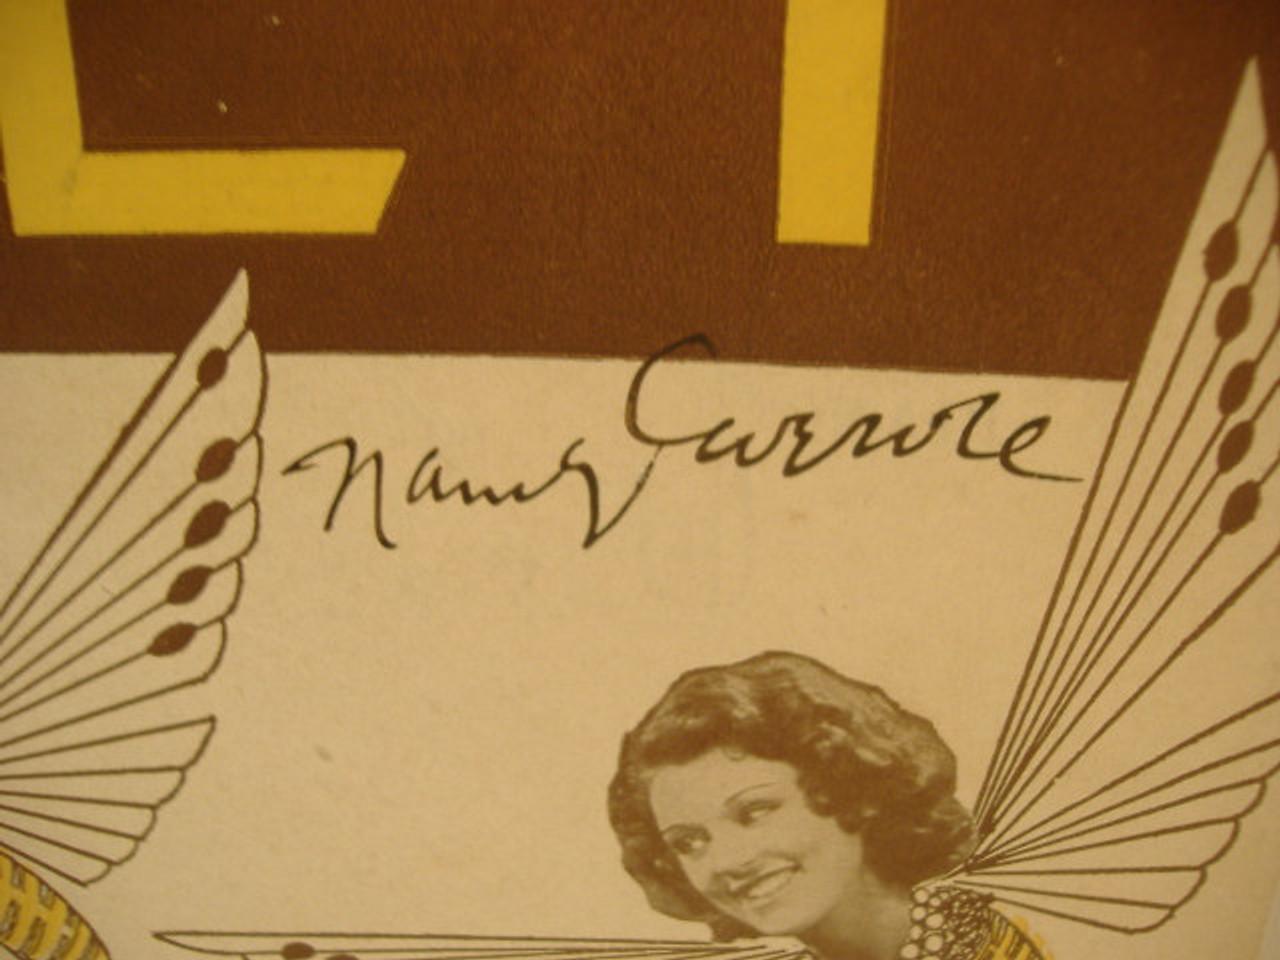 Carroll, Nancy Skeets Gallagher Sheet Music Signed Autograph Sing You Sinners Honey 1930